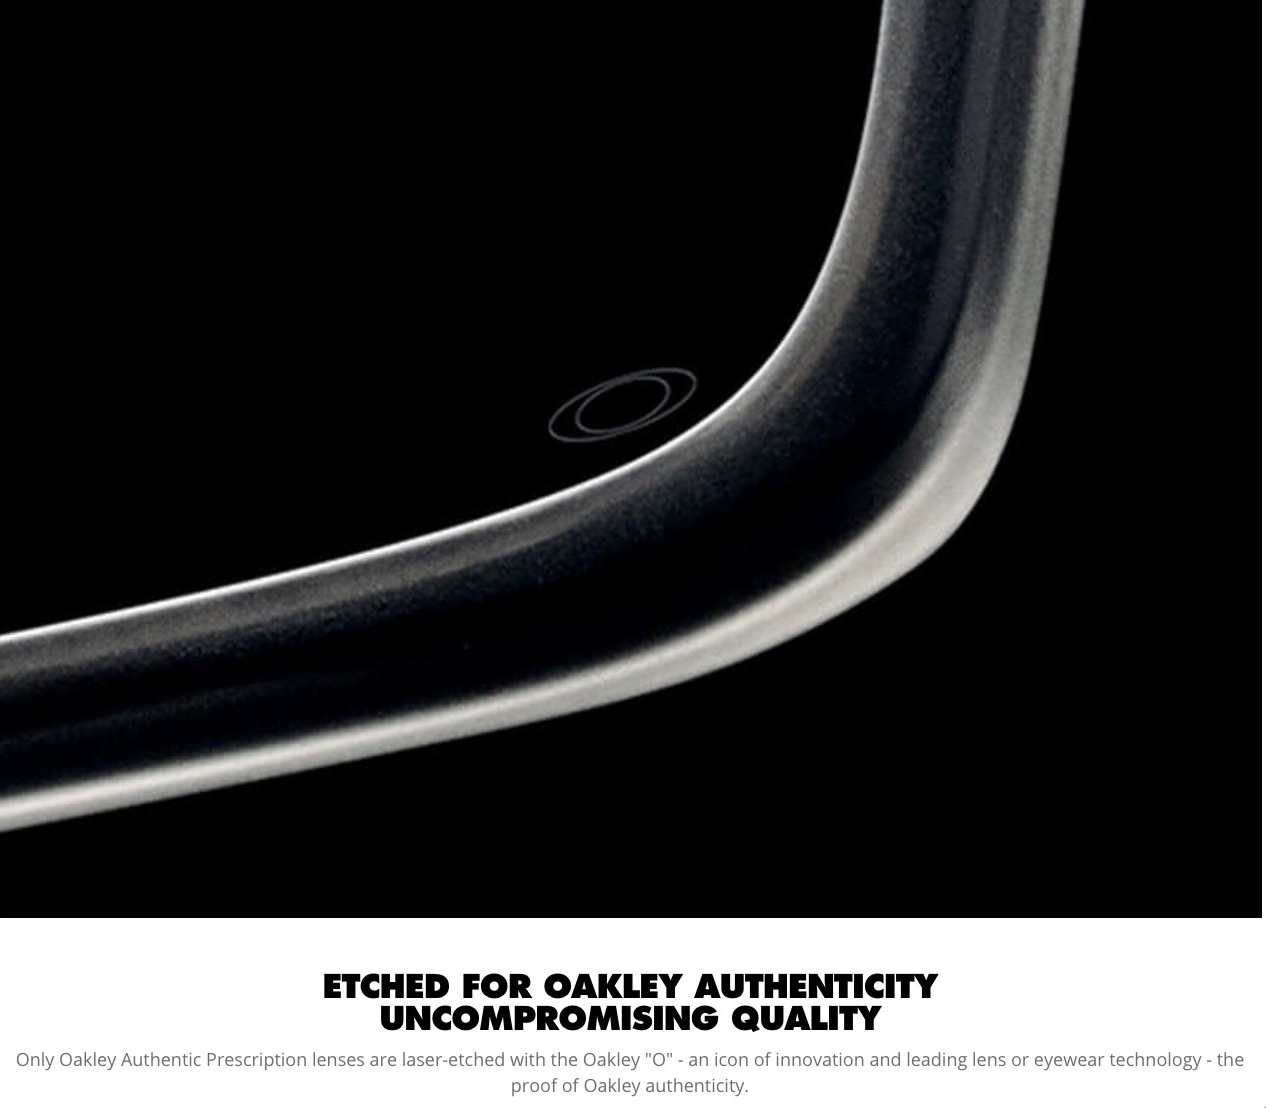 Oakley Lenses Precision Edging